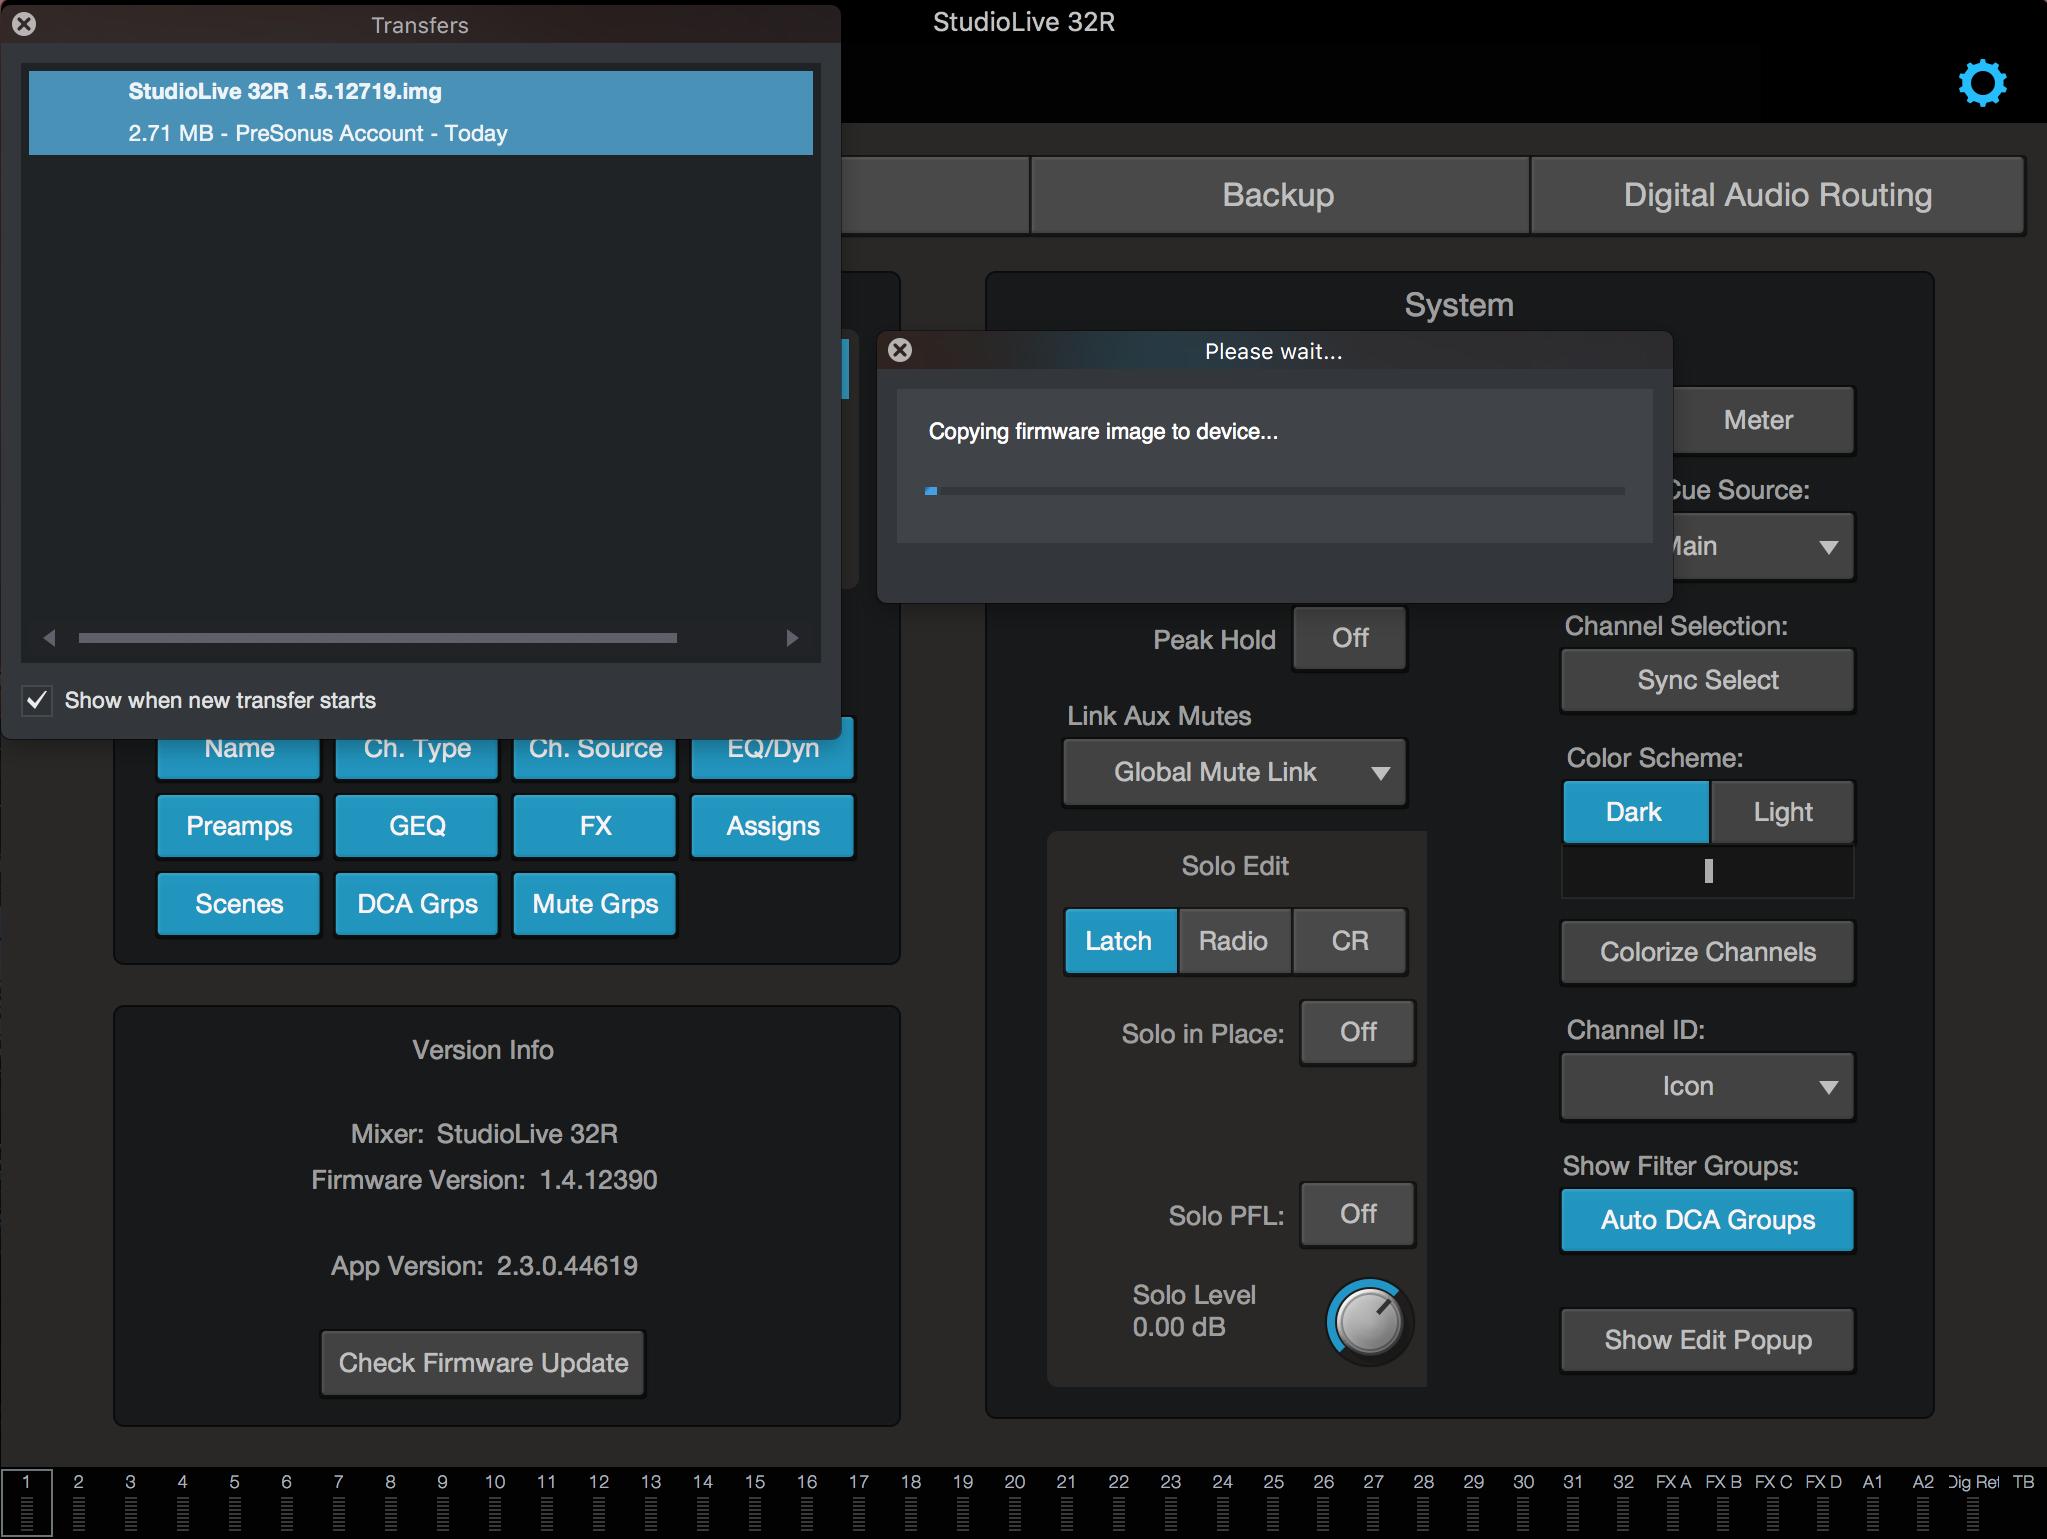 StudioLive Series III Rack mixer - Firmware Update – Knowledge Base